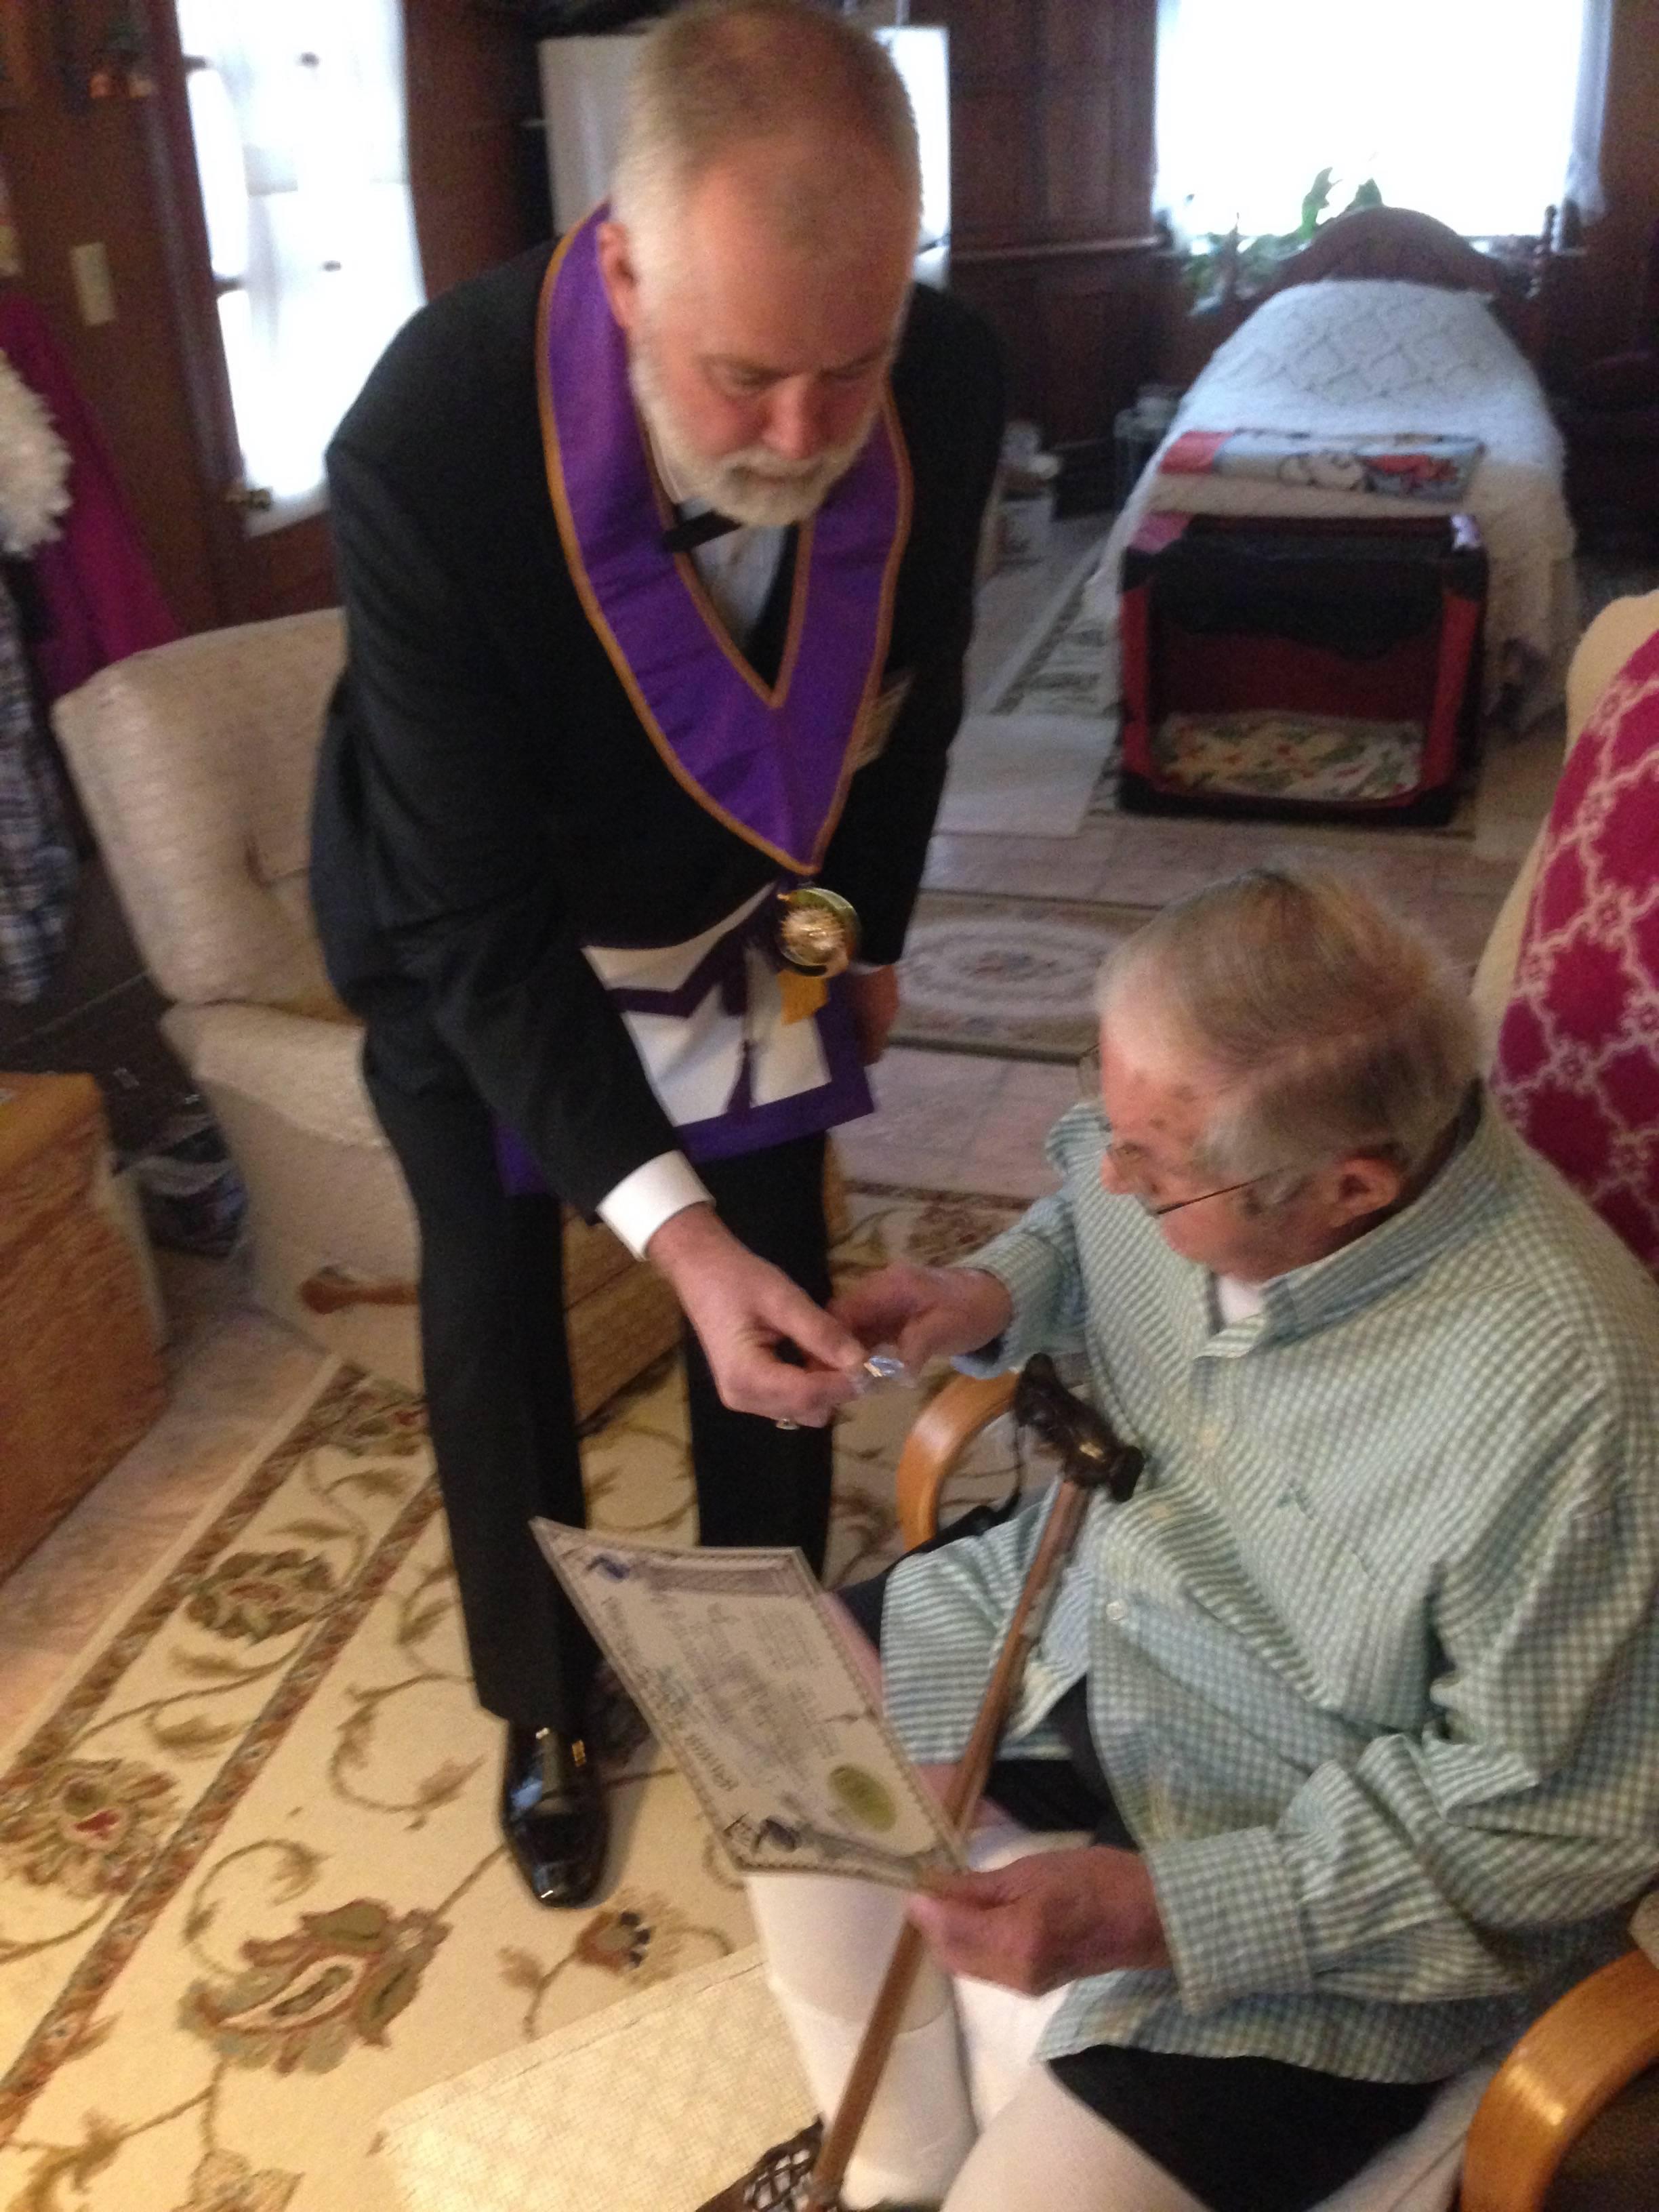 GRAND INSPECTOR PRESENTING 70 YEAR AWARD